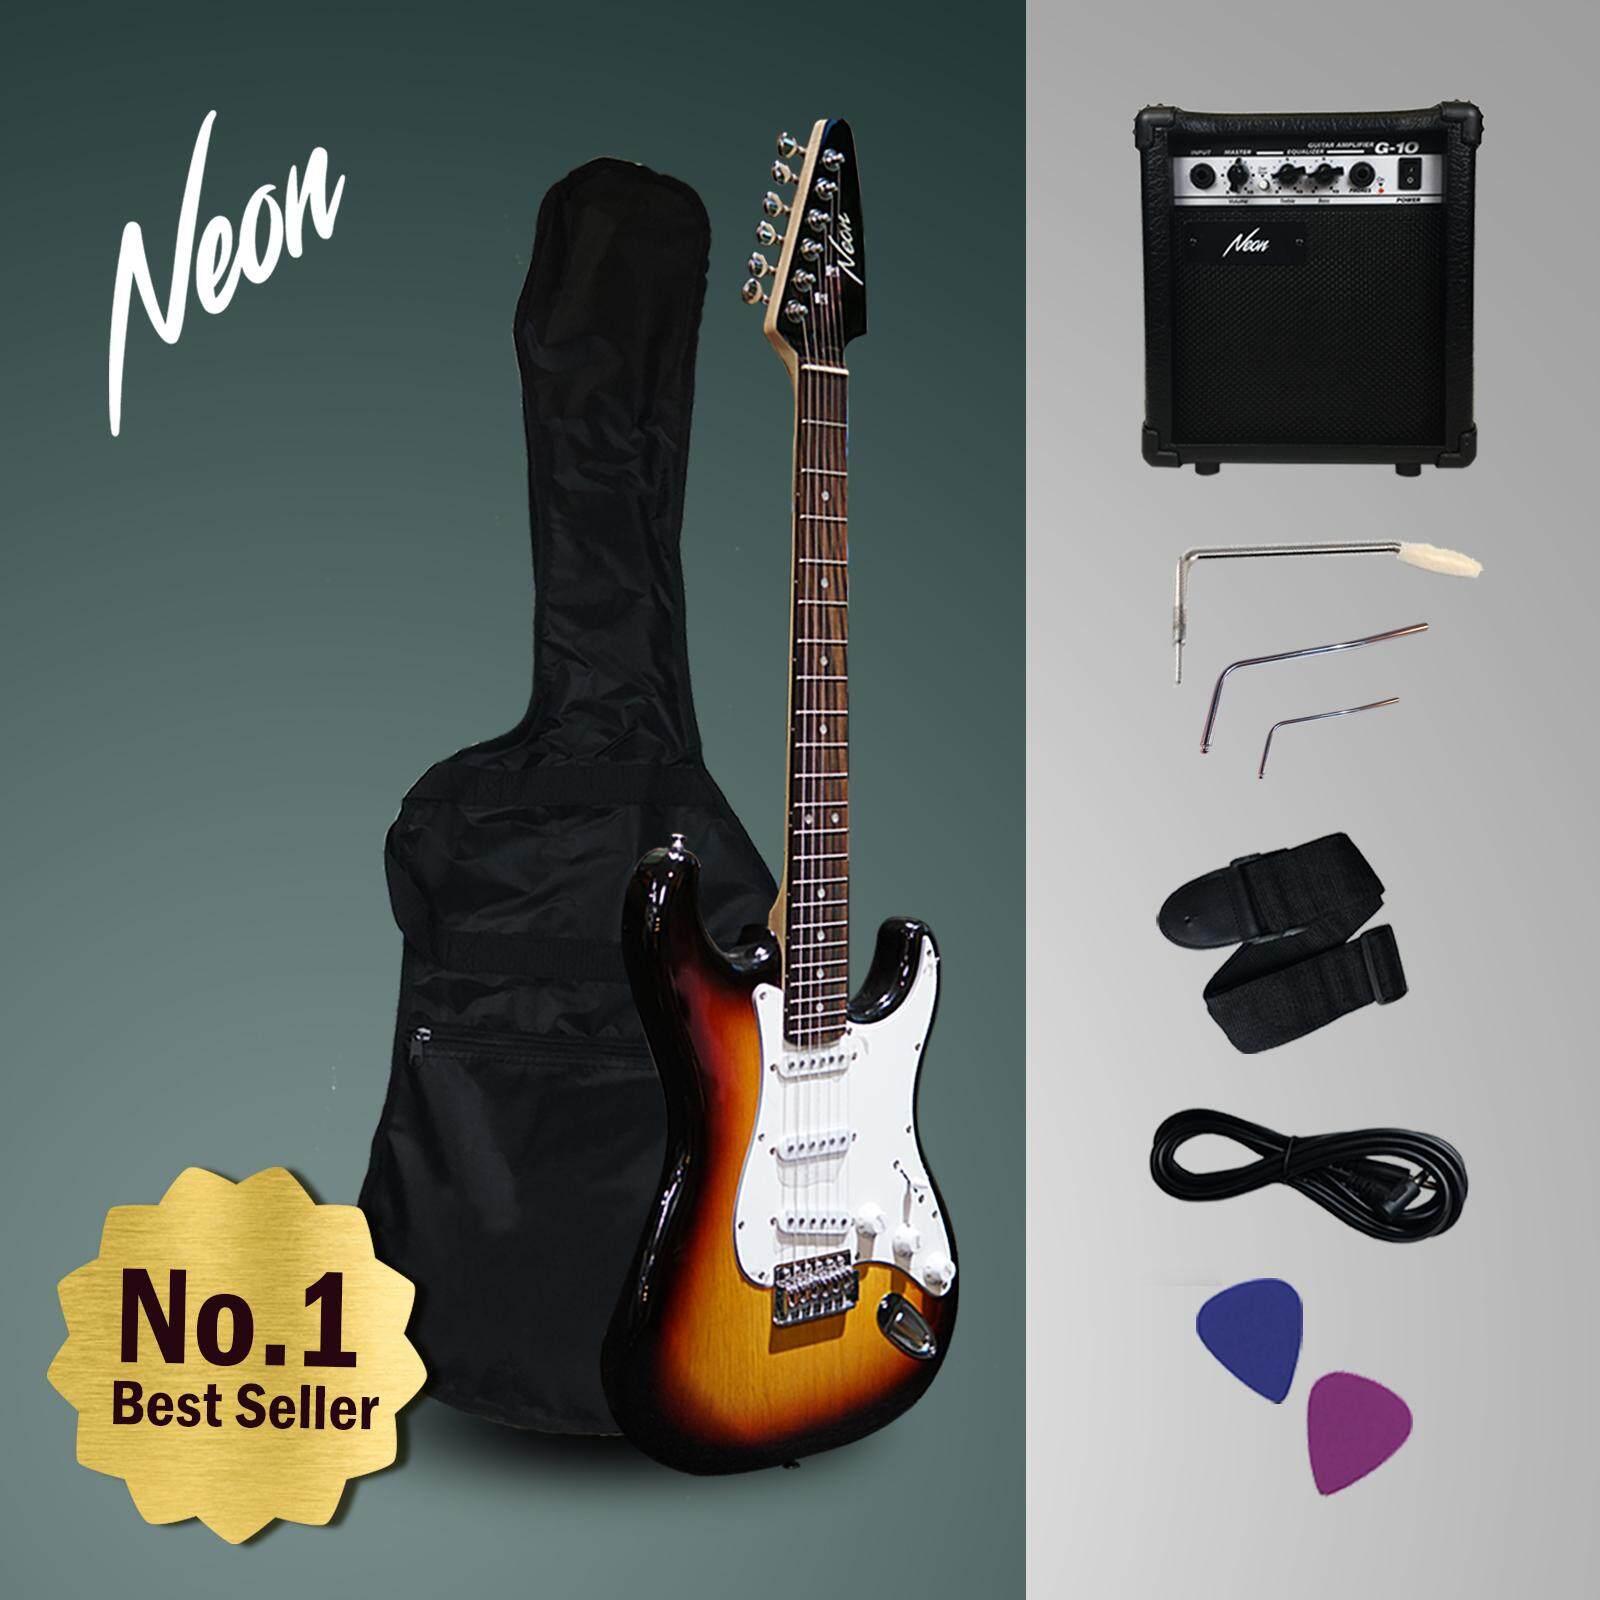 Taloha Neon Jumpstart Electric Guitar Package Sunburst 10W Amplifier Full Set